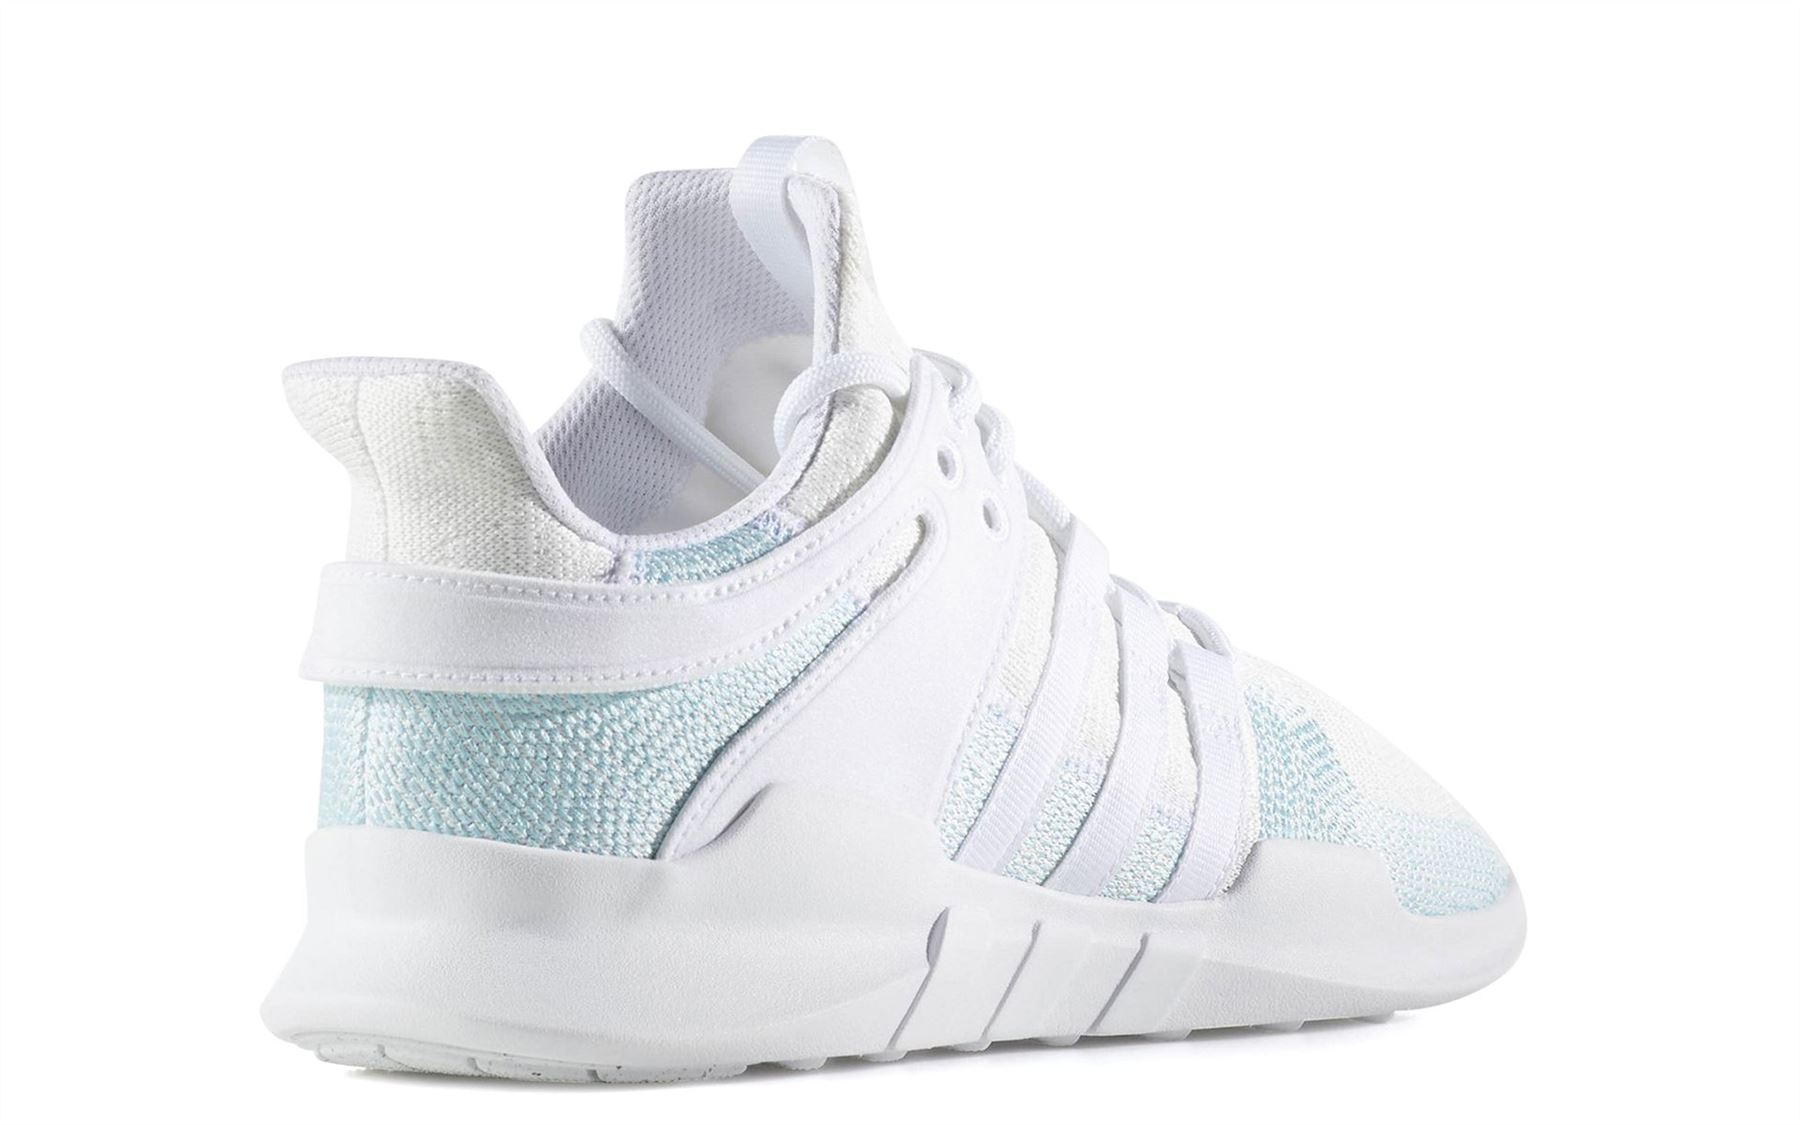 adidas-EQT-Support-ADV-Mens-Trainers-Originals-RRP-90-SAVE-039-S-MOST-SIZES miniatuur 5